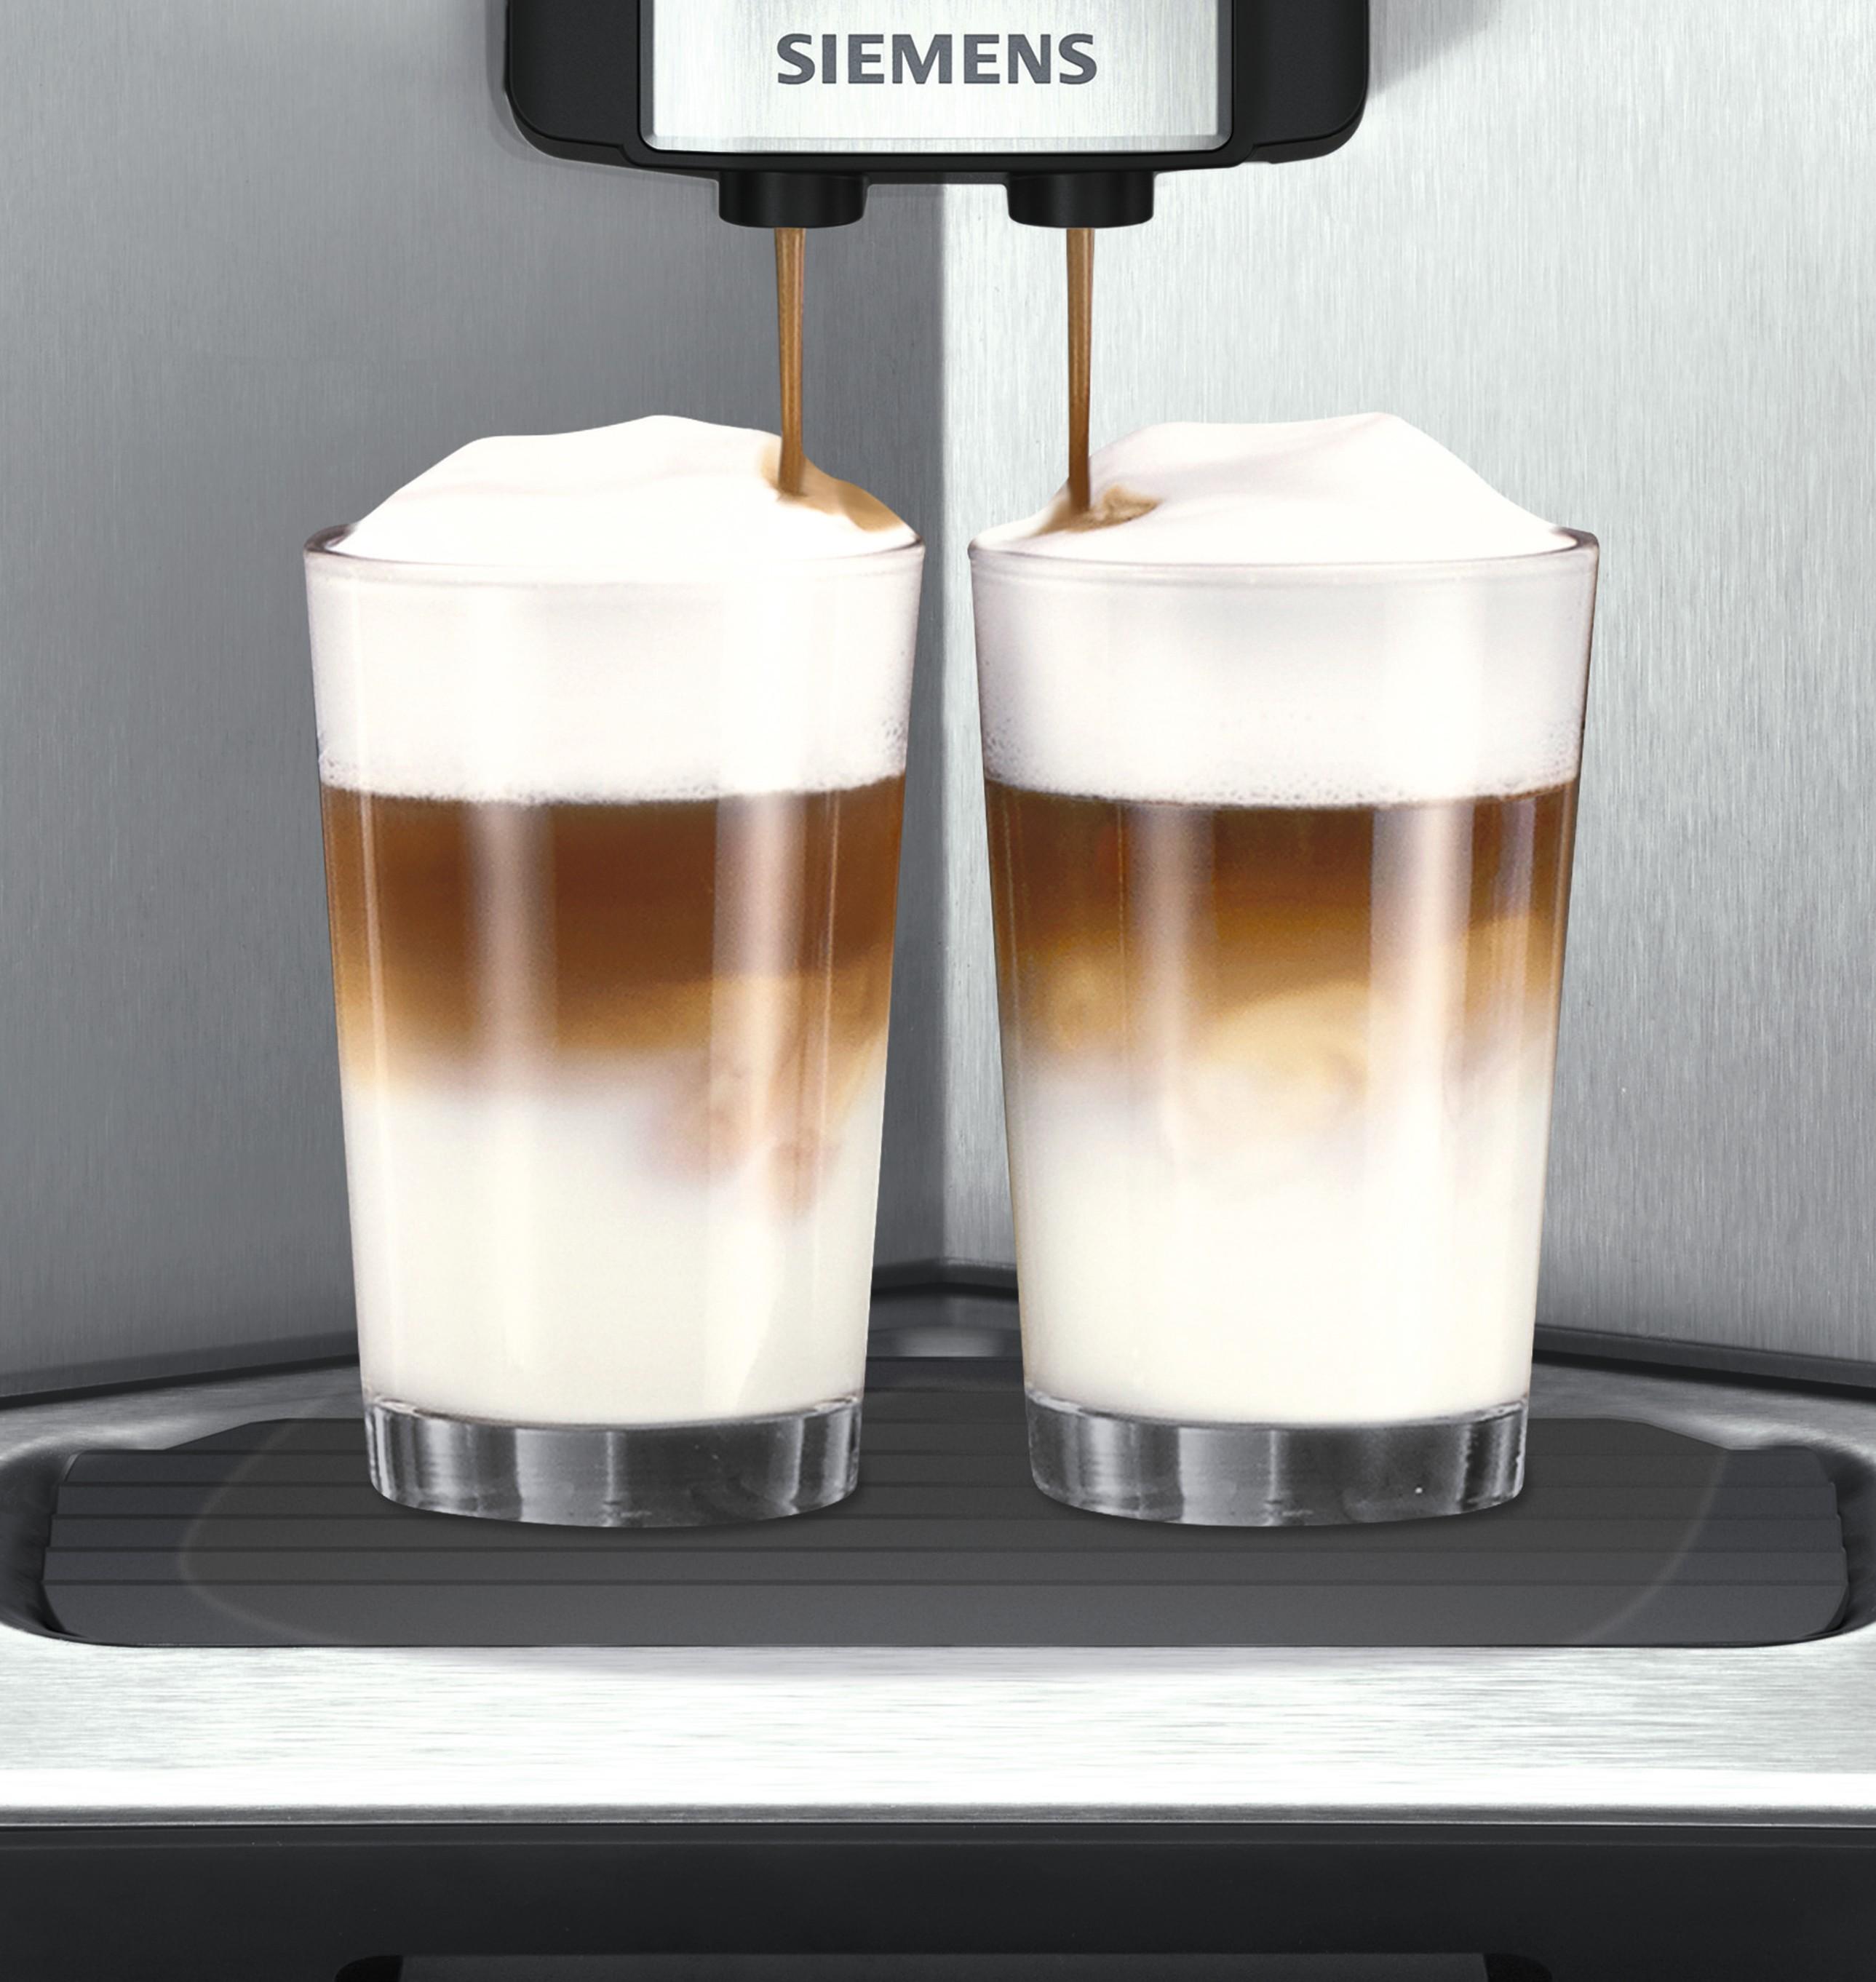 Siemes Eq 9 Series 700 Automatic Coffee Machine Ti907201rw Crema